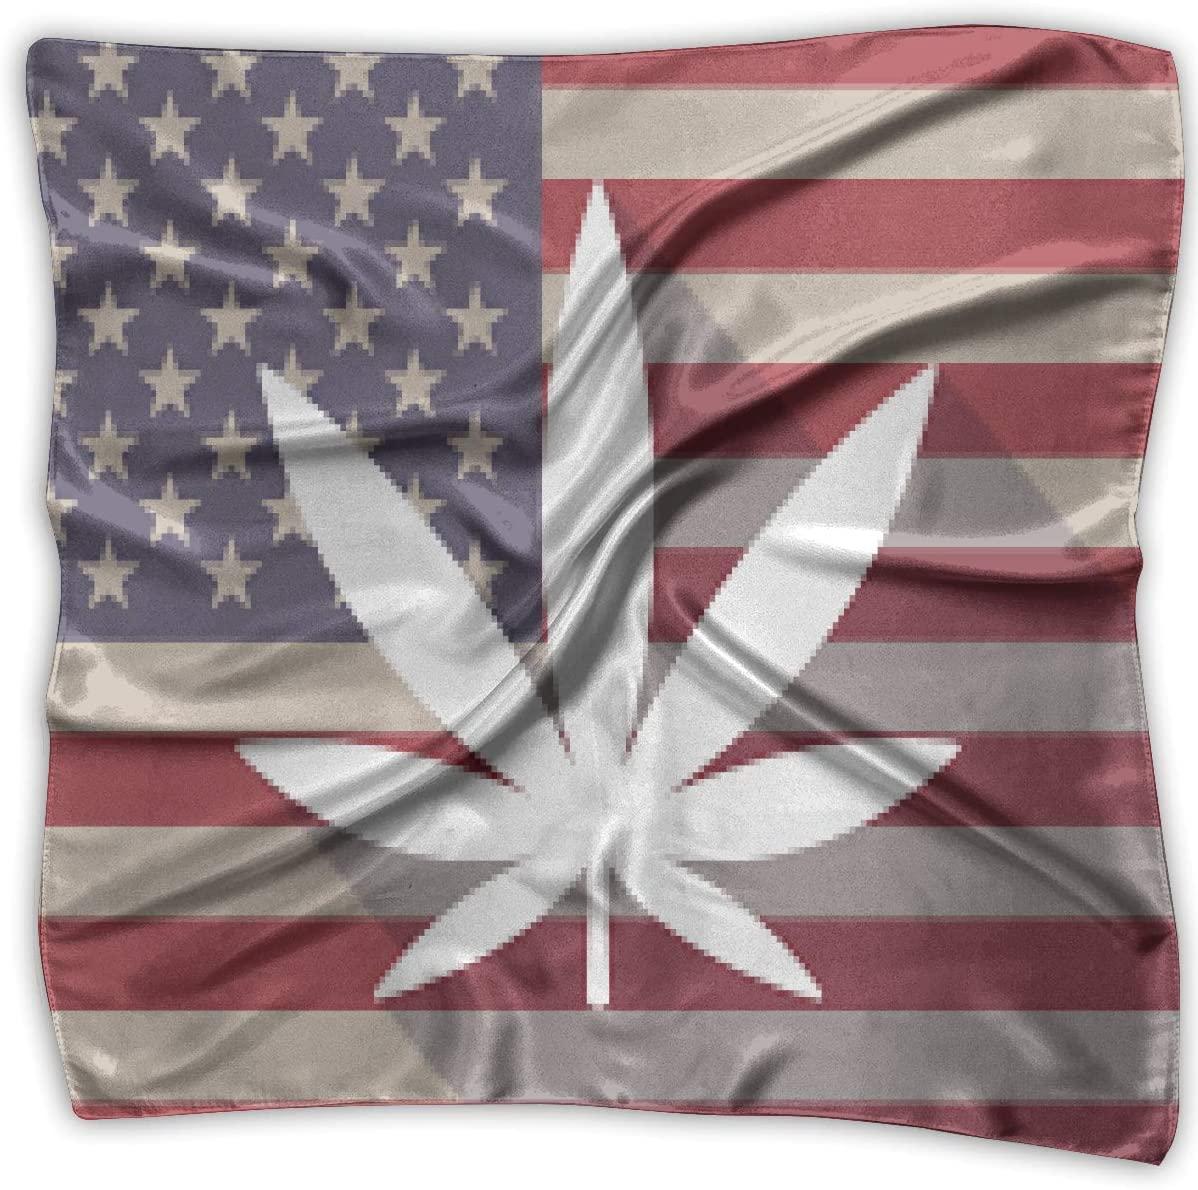 WFIRE USA Flag Weed Square Handkerchiefs Scarf Shawl Bandanas Headscarf Neckerchief Tie Hair Scarf